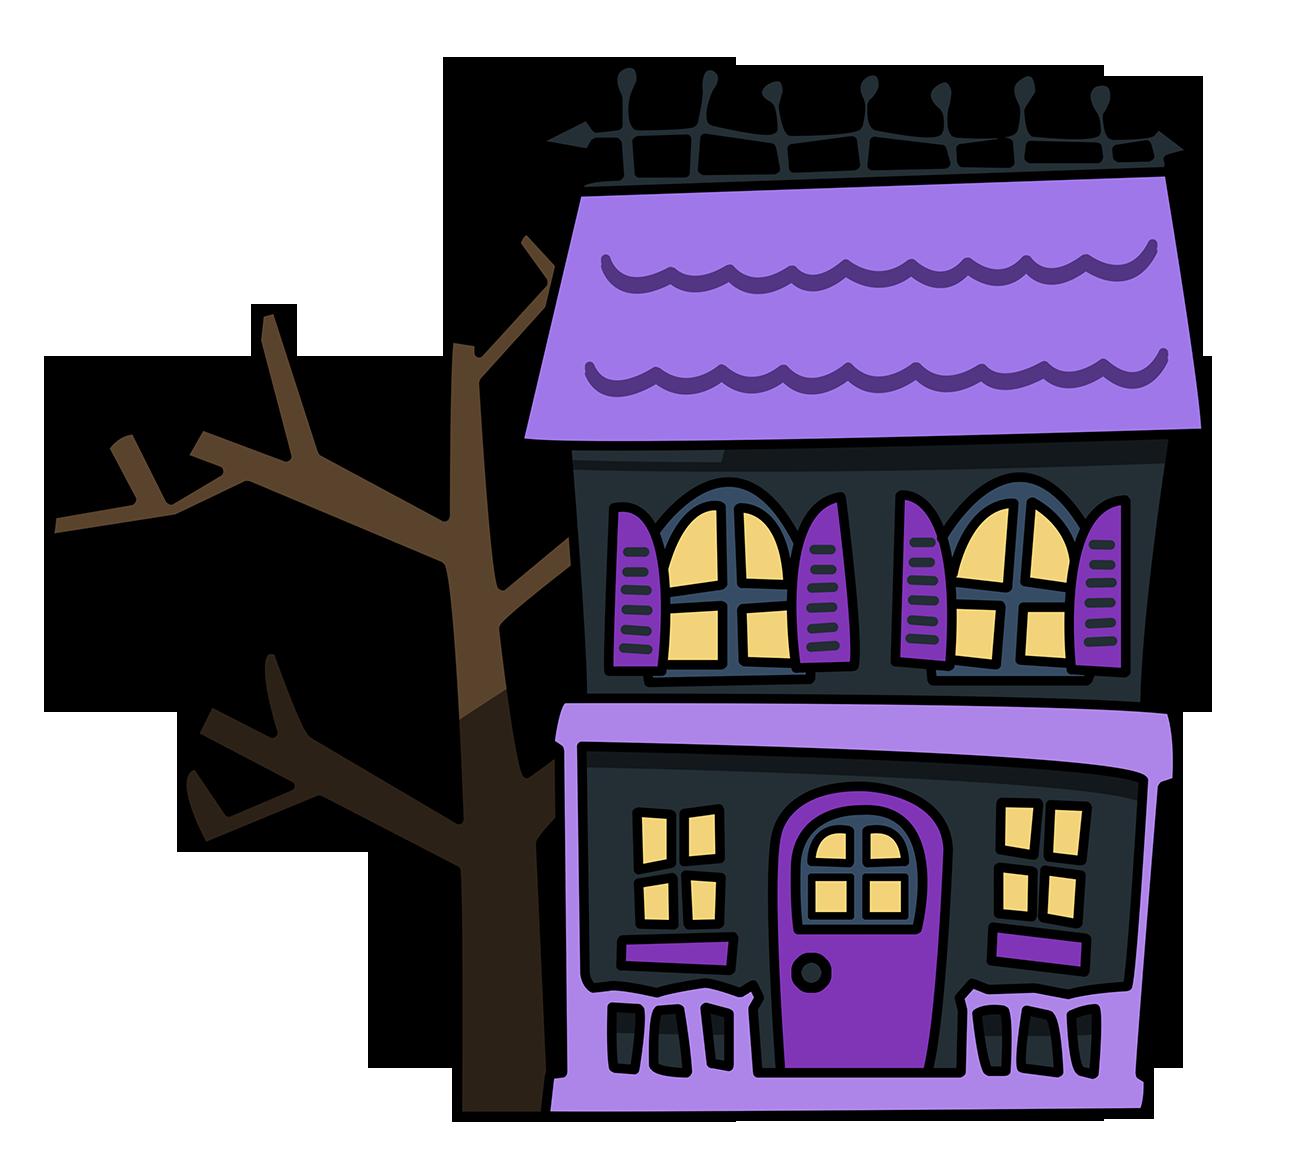 haunted house clipart-haunted house clipart-15